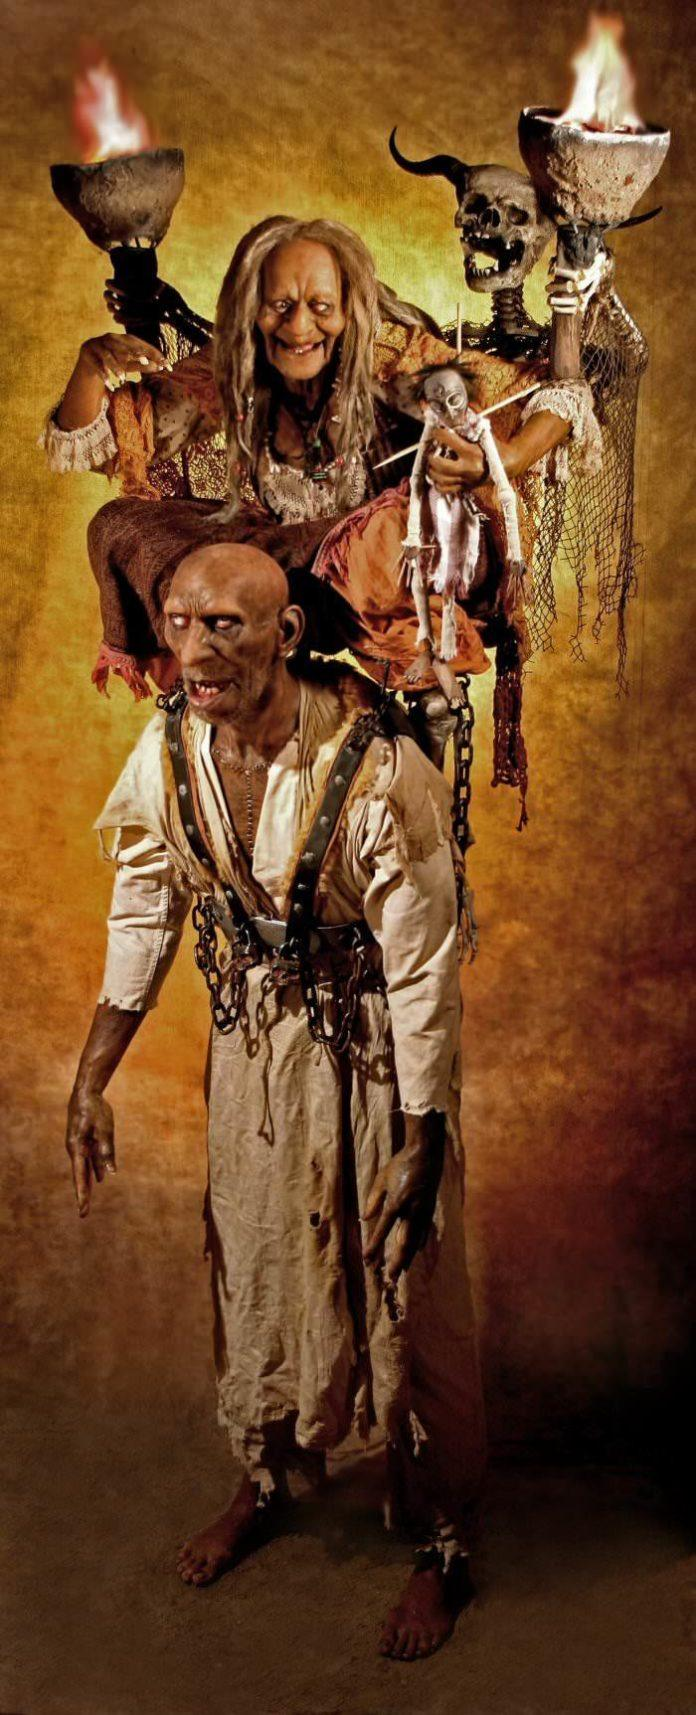 thomas kuebler life size sculpture voodoo hoodo grandma zombie creepy funny statue